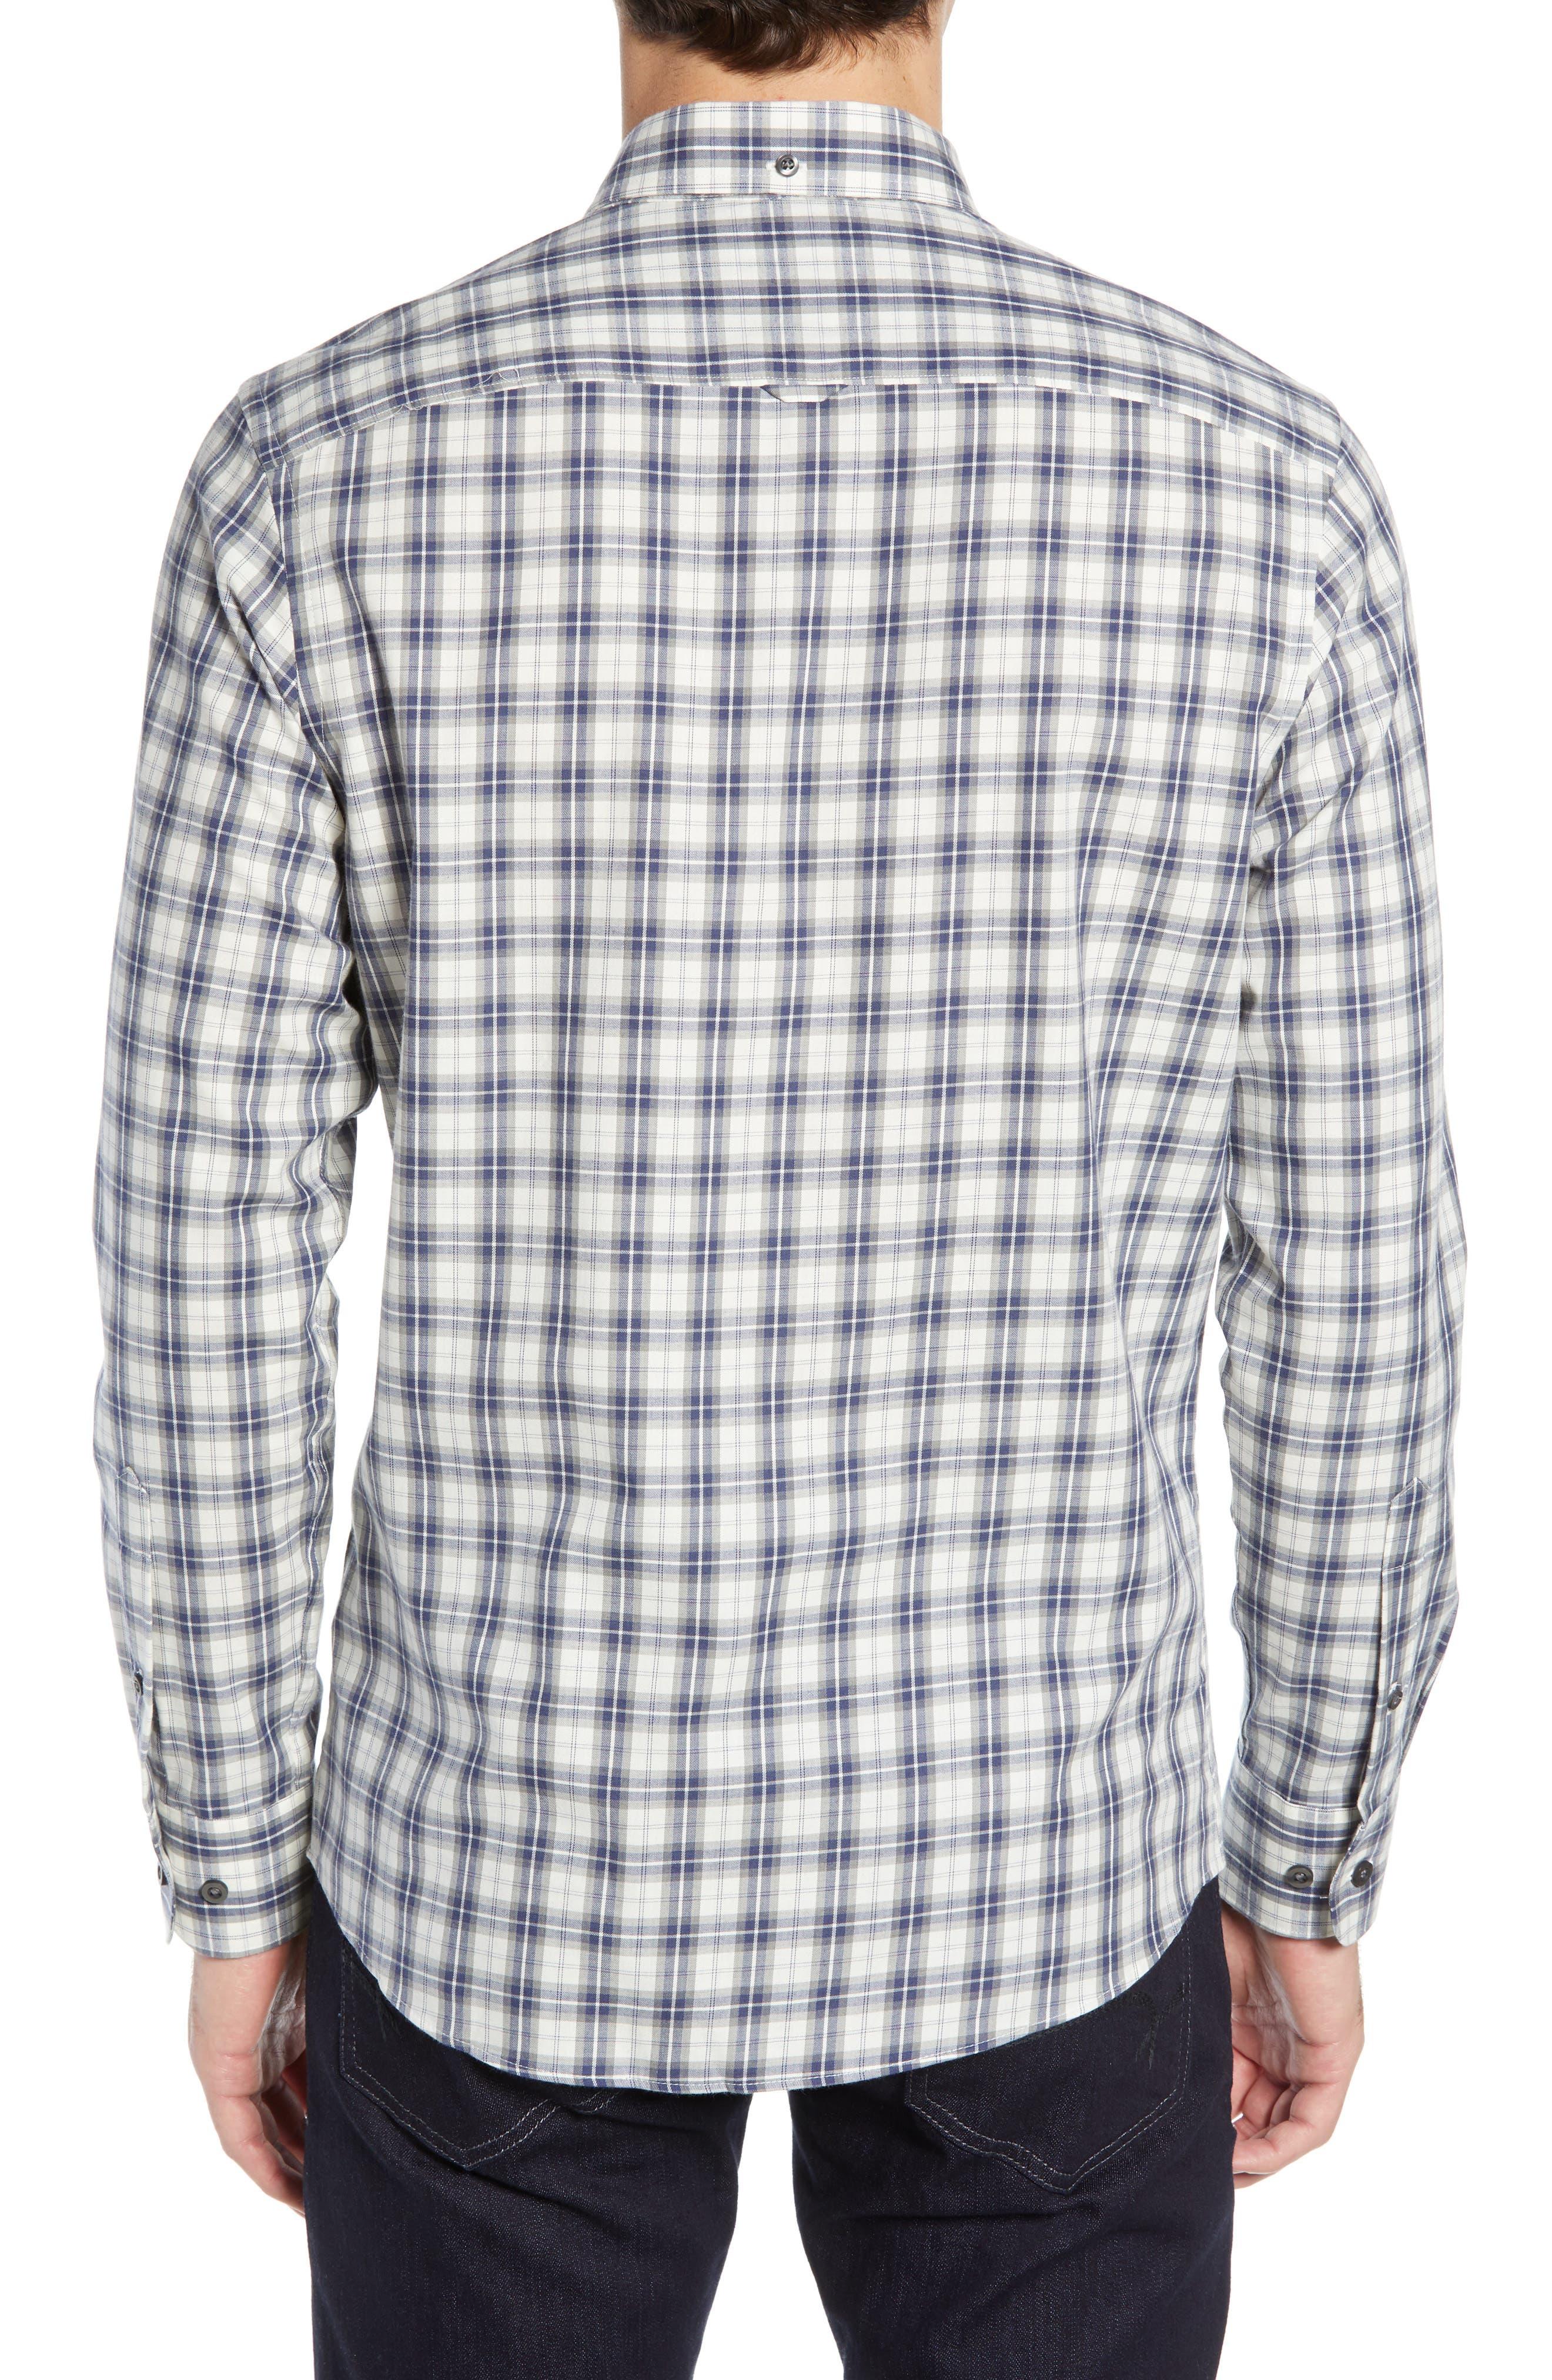 Slim Fit Plaid Sport Shirt,                             Alternate thumbnail 3, color,                             WHITE BLUE ENSIGN GREY PLAID